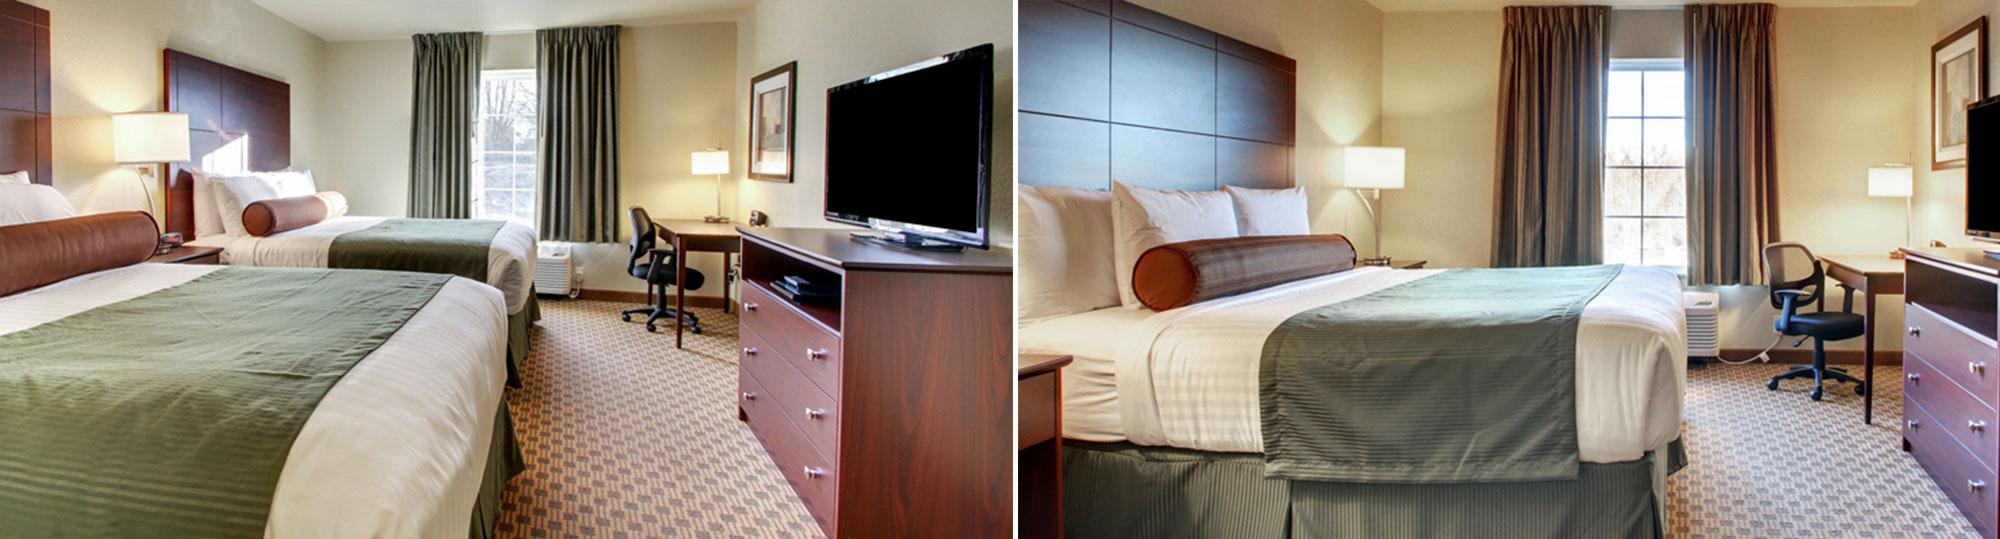 Cobblestone Hotel and Suites Newport